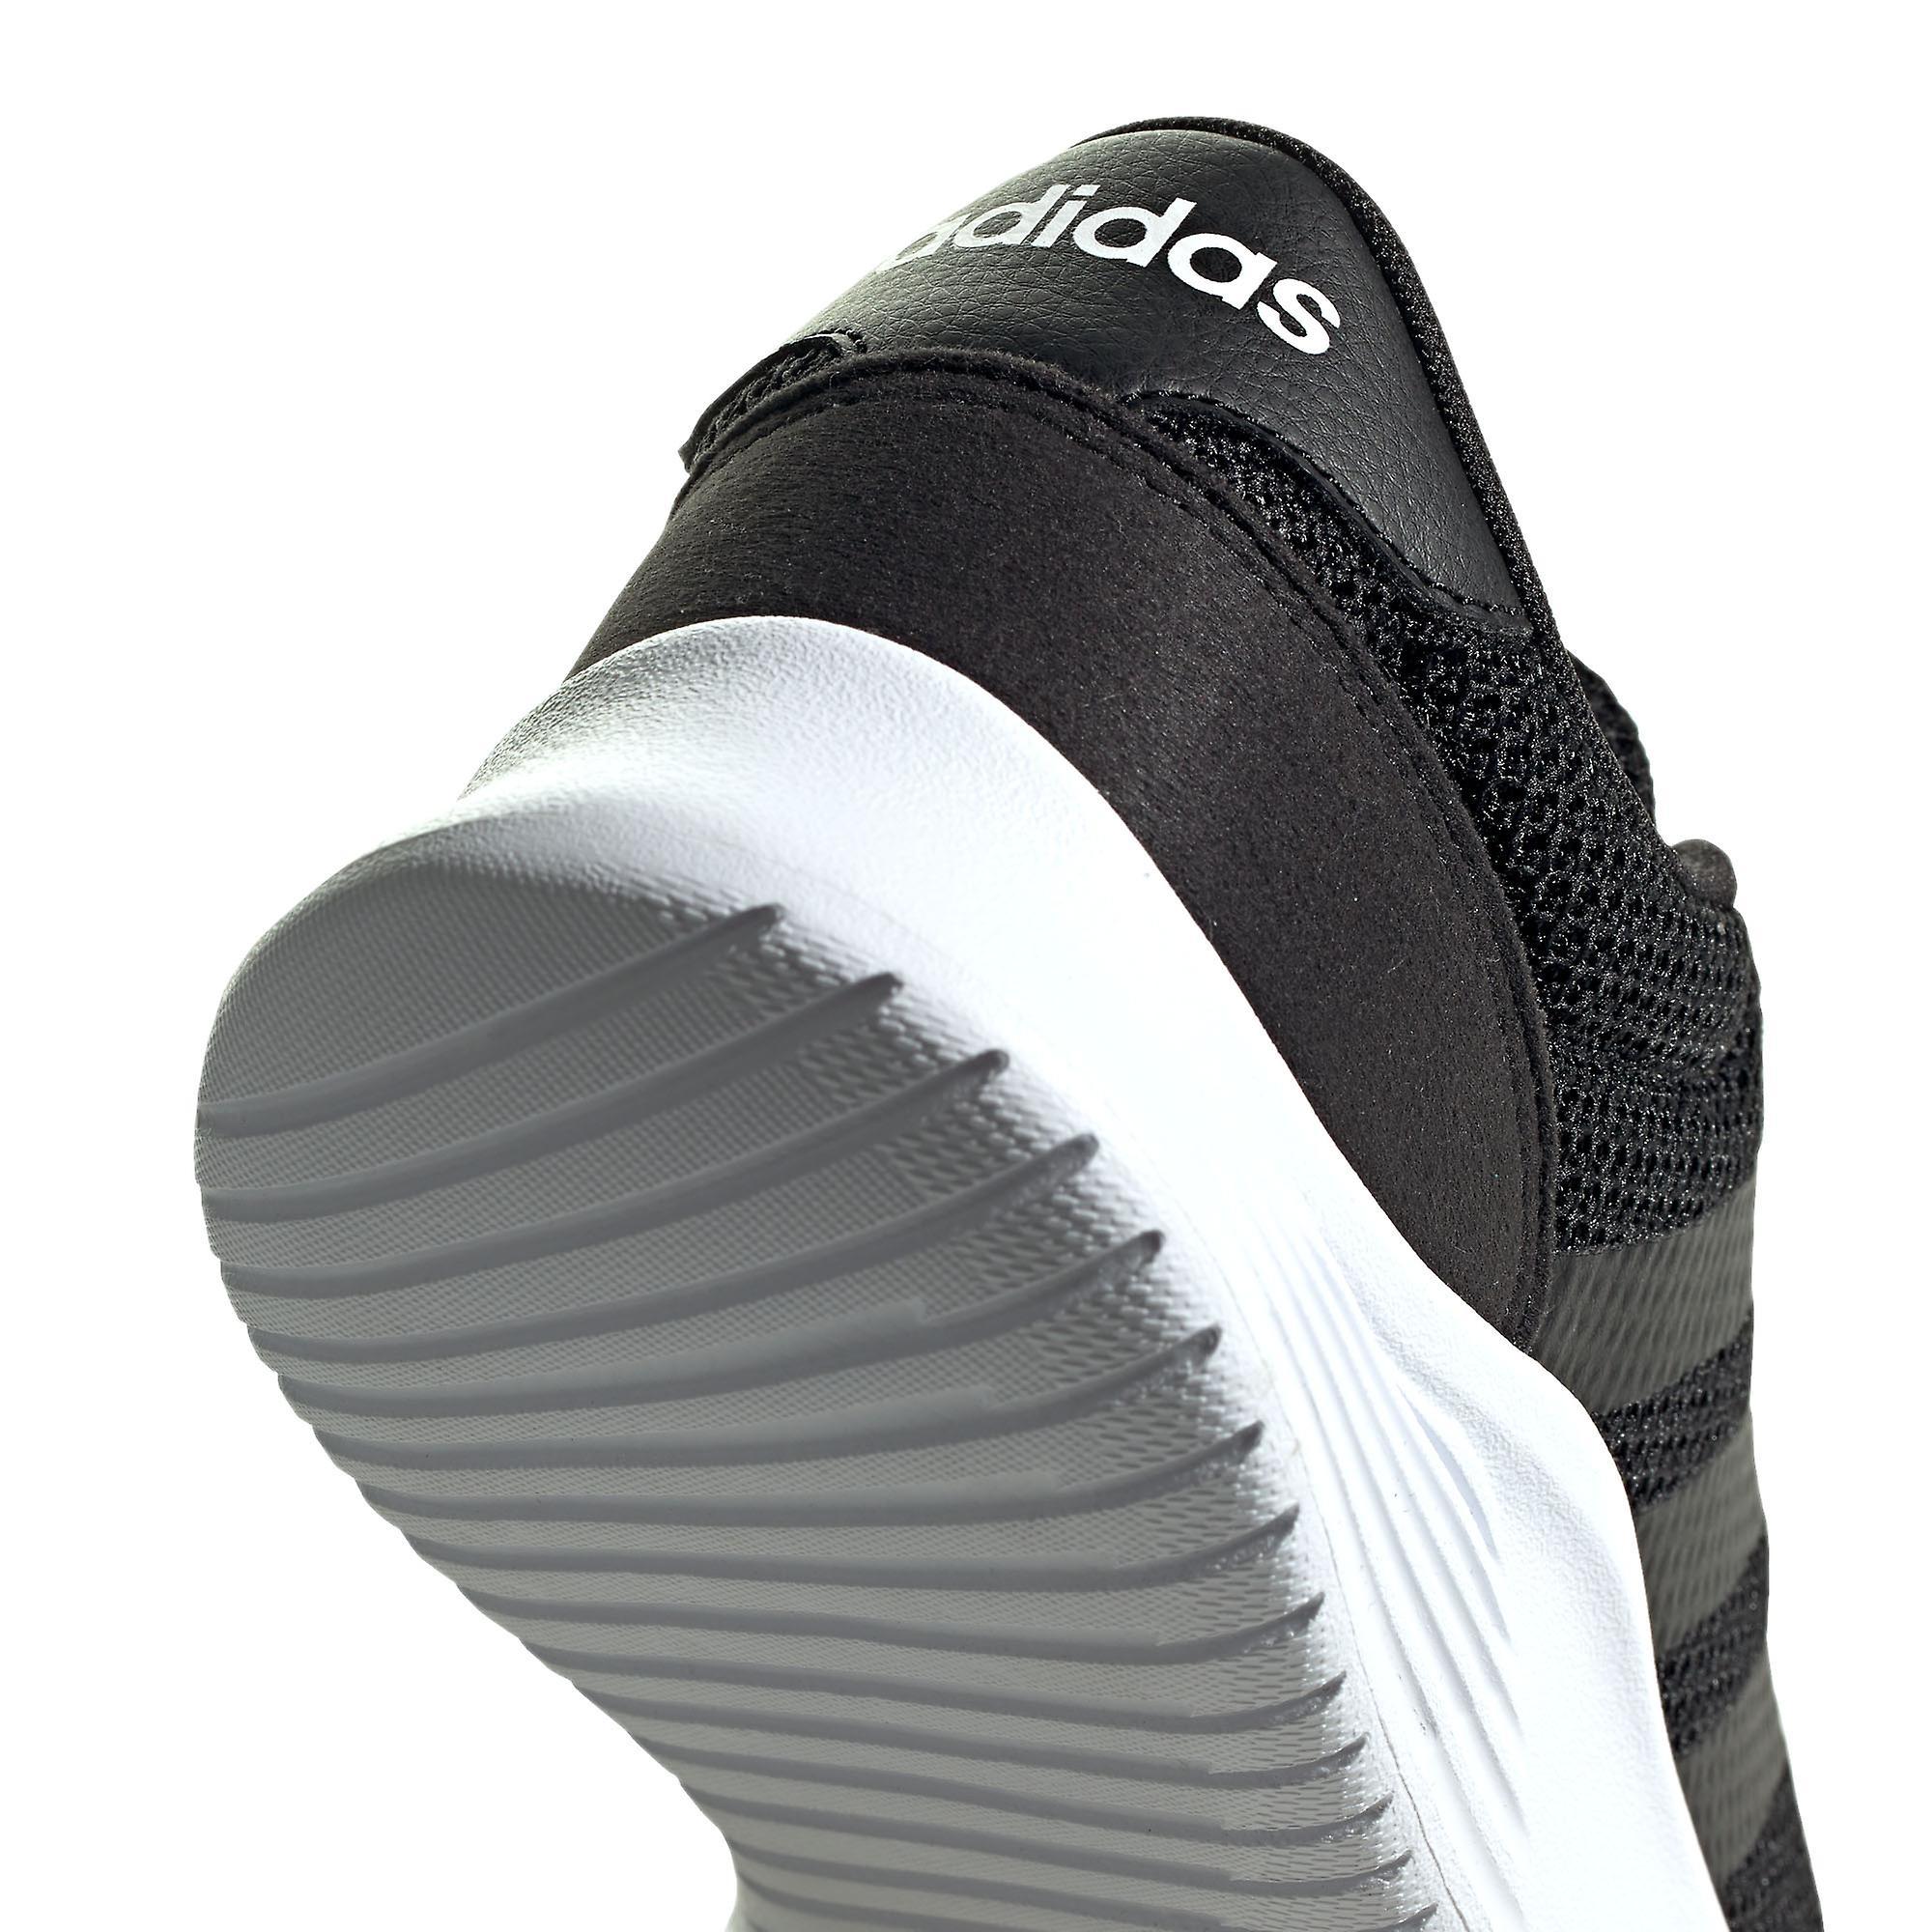 adidas Lite Racer 2.0 Mens Sports Fashion Trainer Shoe Black/White dLbrZk